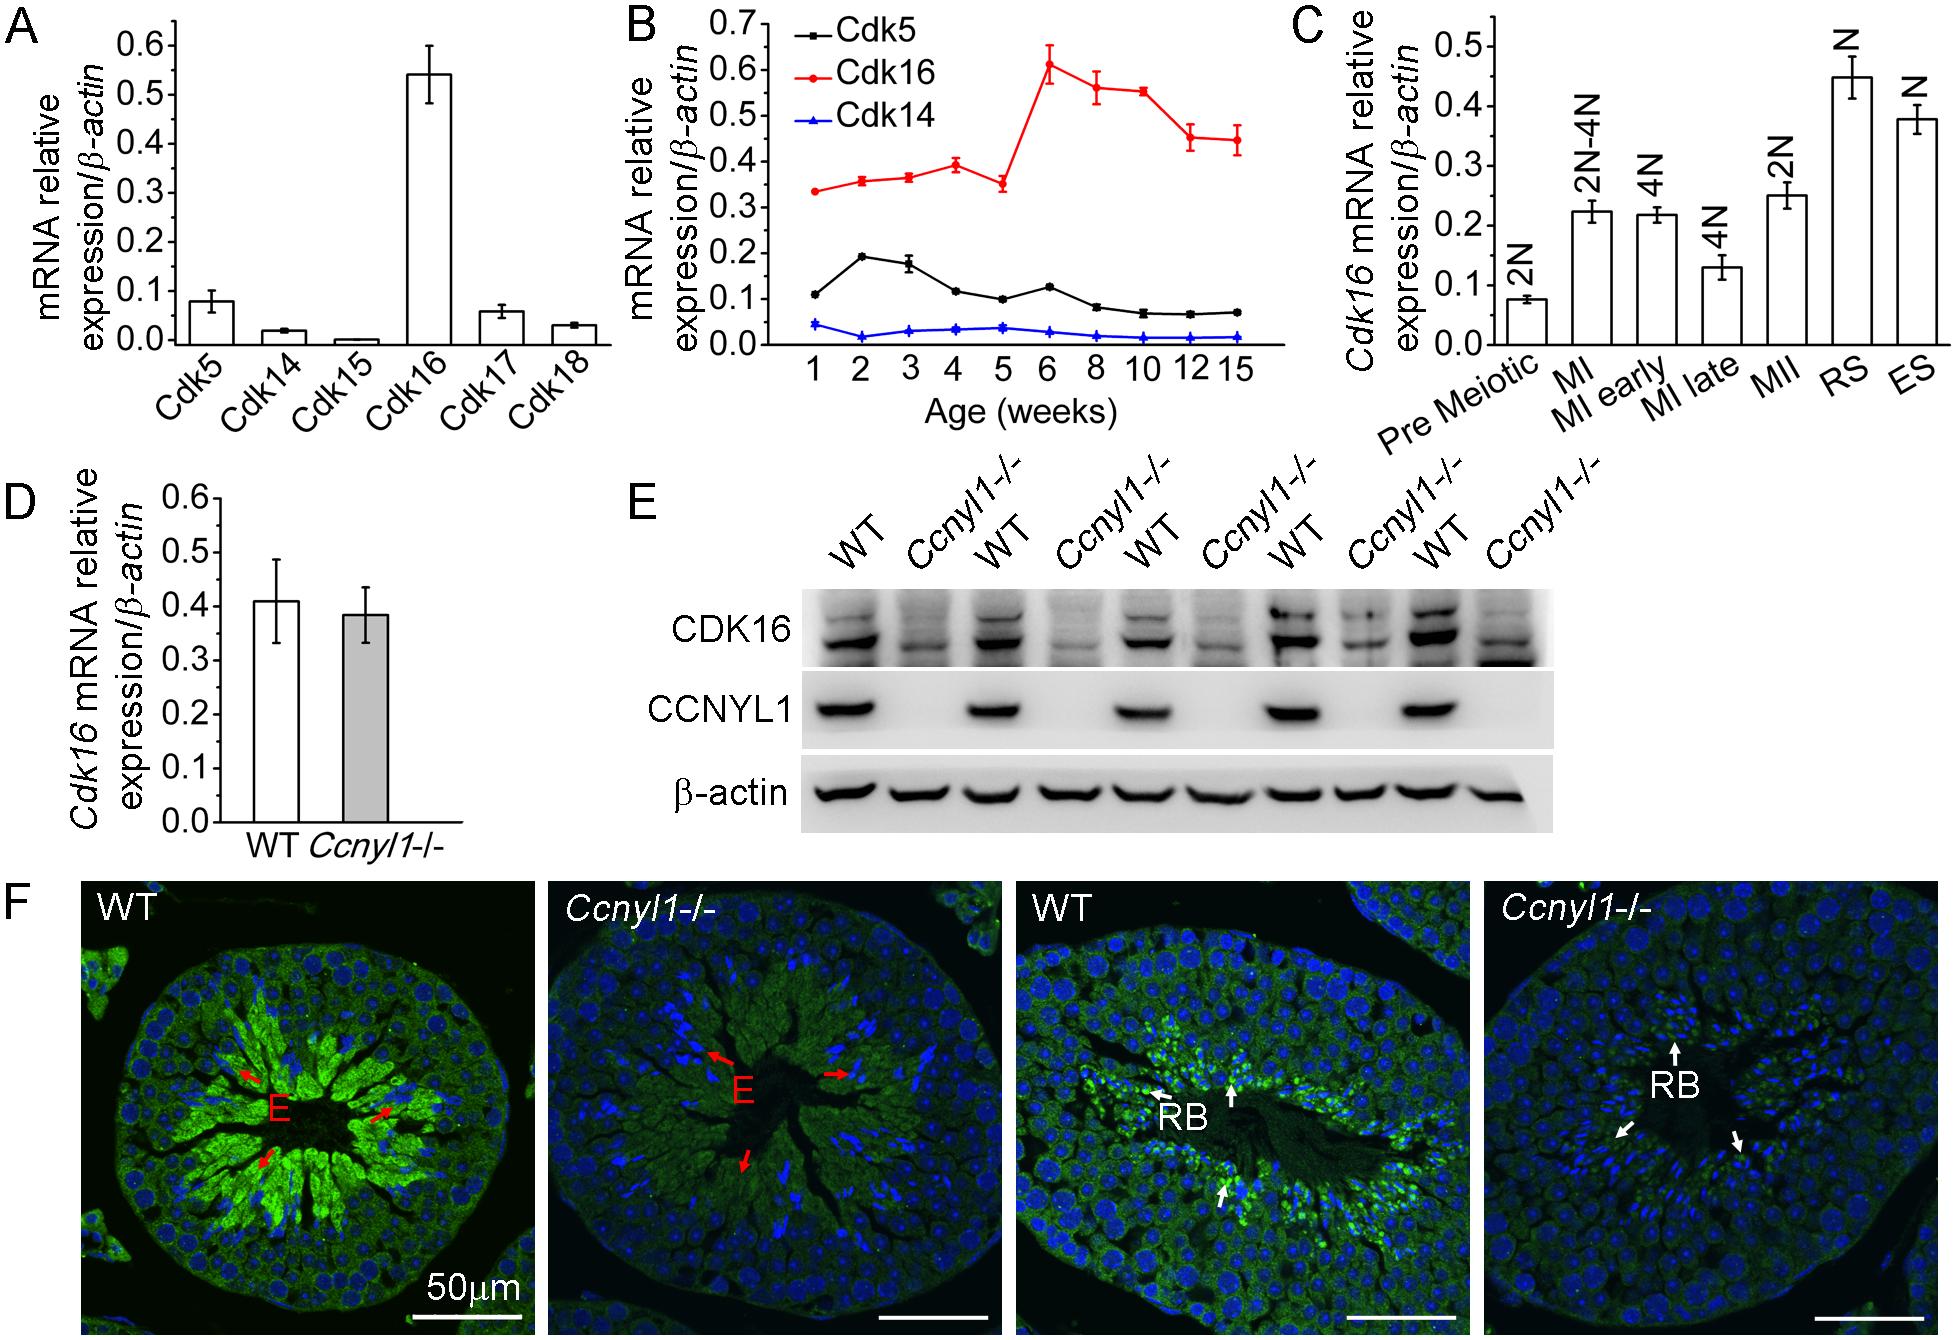 CDK16 protein level is decreased in <i>Ccnyl1</i>-/- testis.